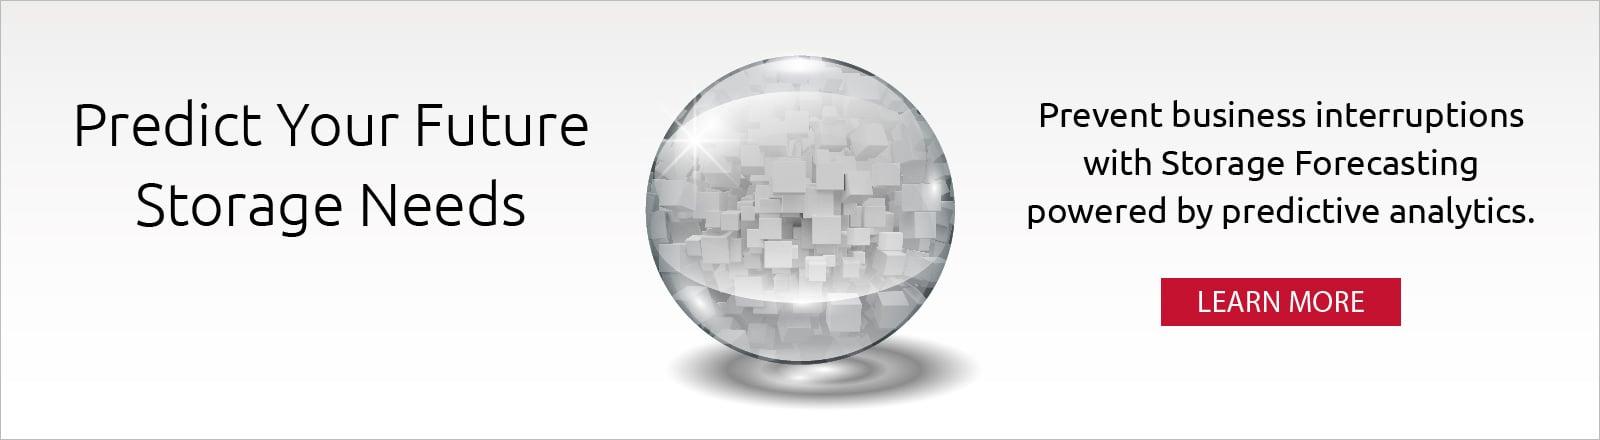 SentryOne Storage Forecasting